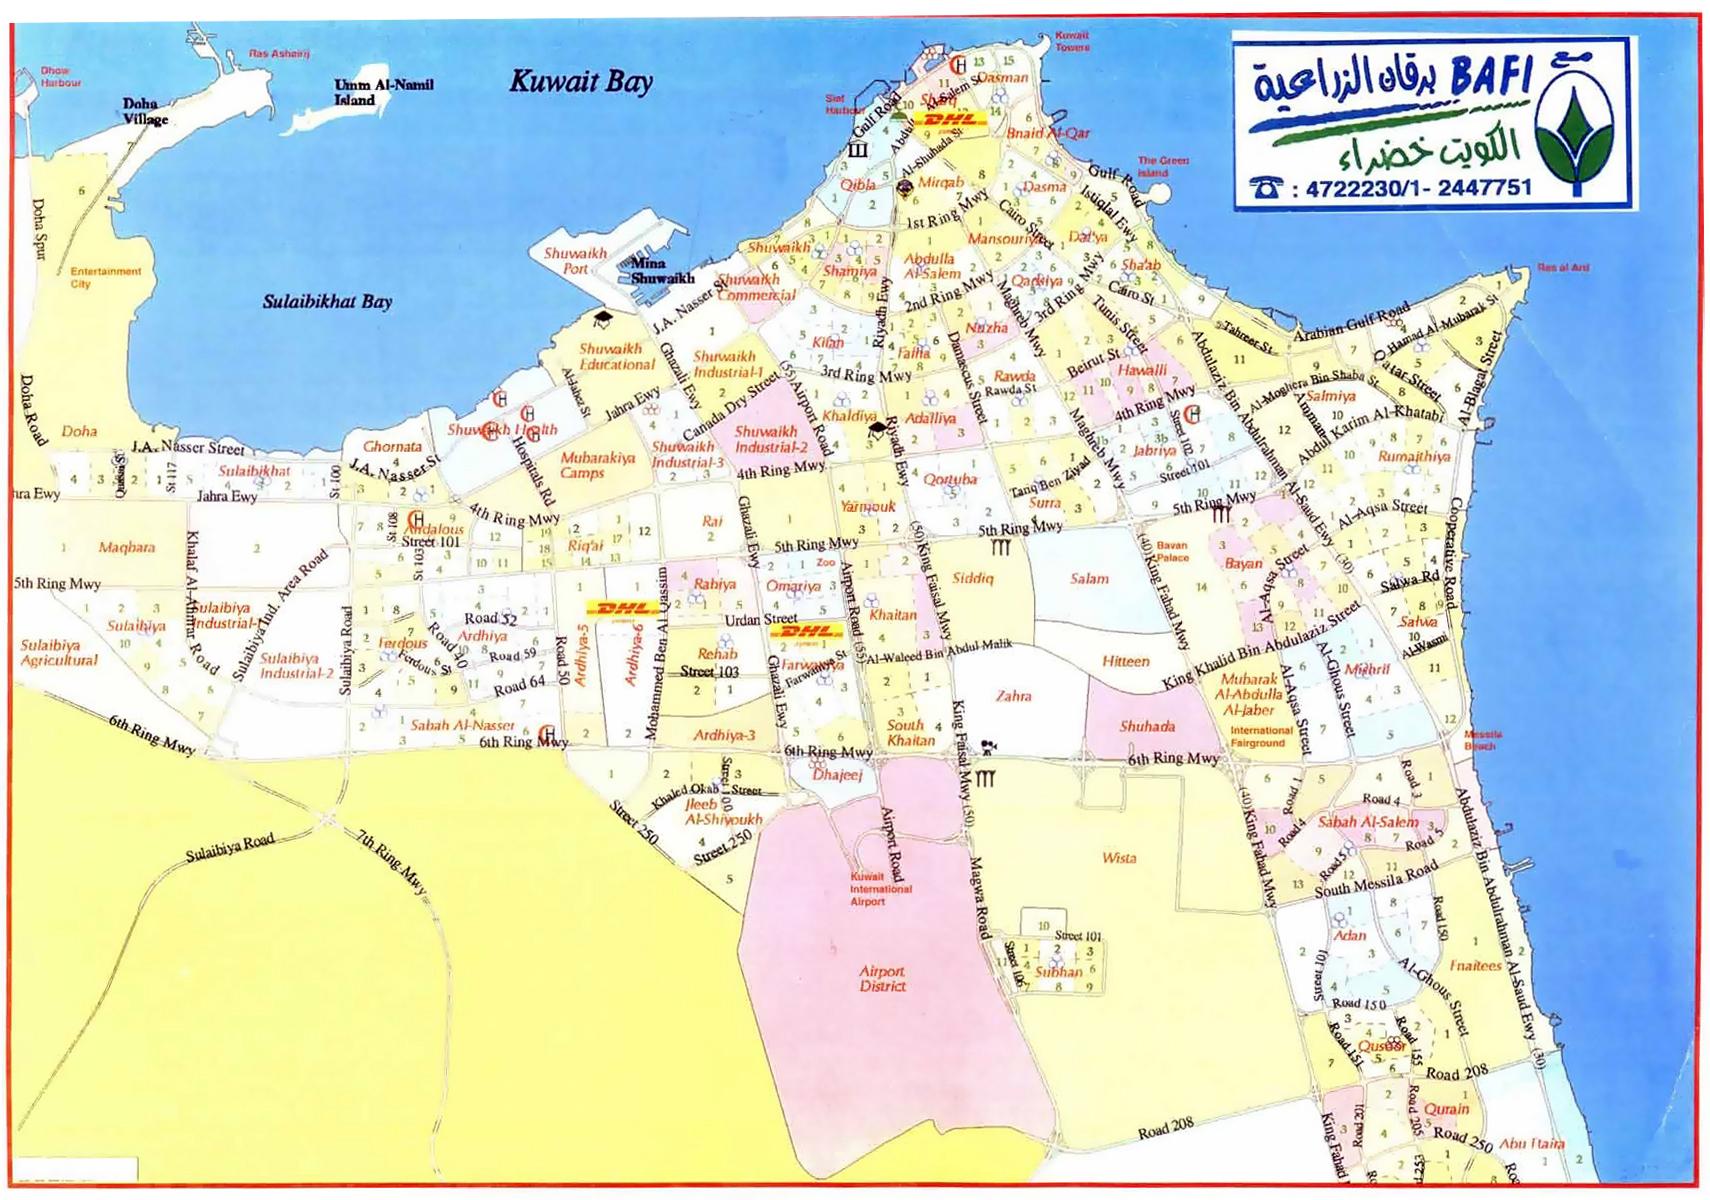 Detailed road map of Al Kuwait city Al Kuwait Kuwait Asia